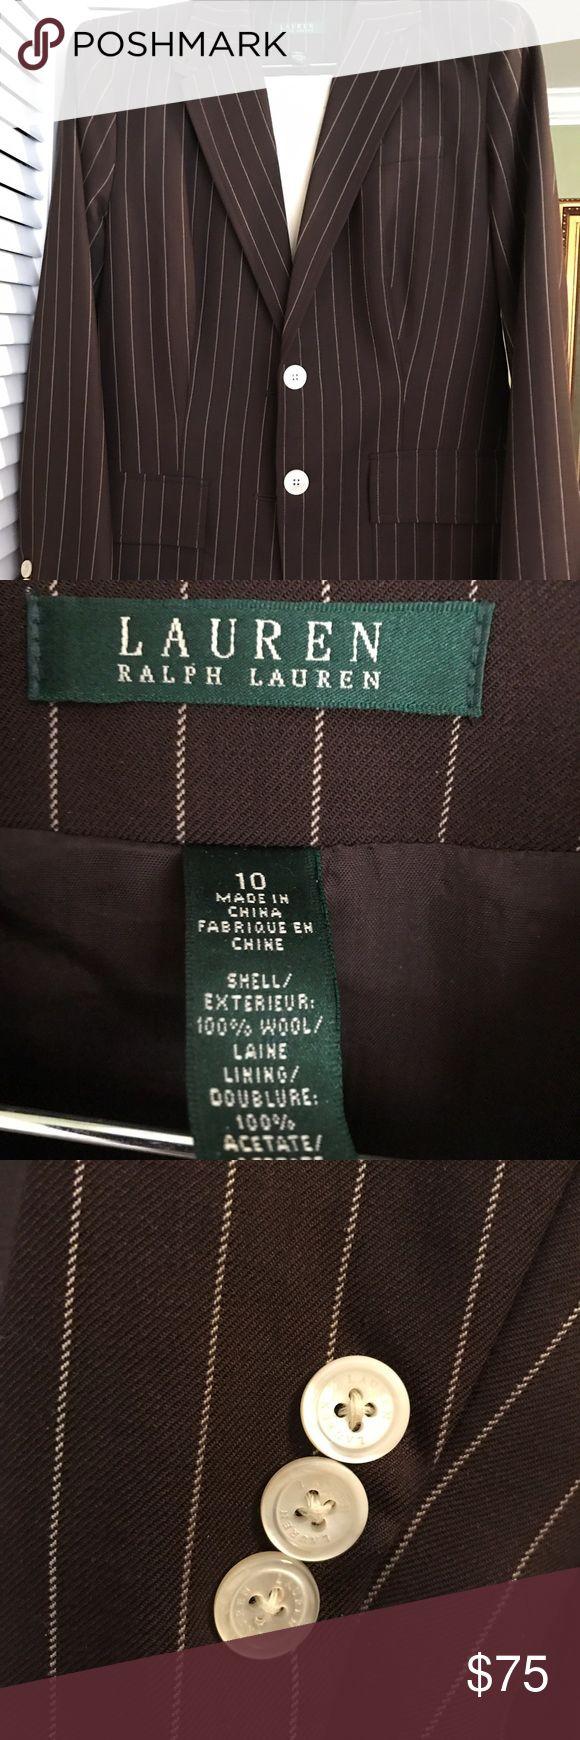 Ralph Lauren Brown Pin Striped Blazer New New with out tags Ralph Laure brown blazer. Pearlized buttons. Ralph Lauren Jackets & Coats Blazers